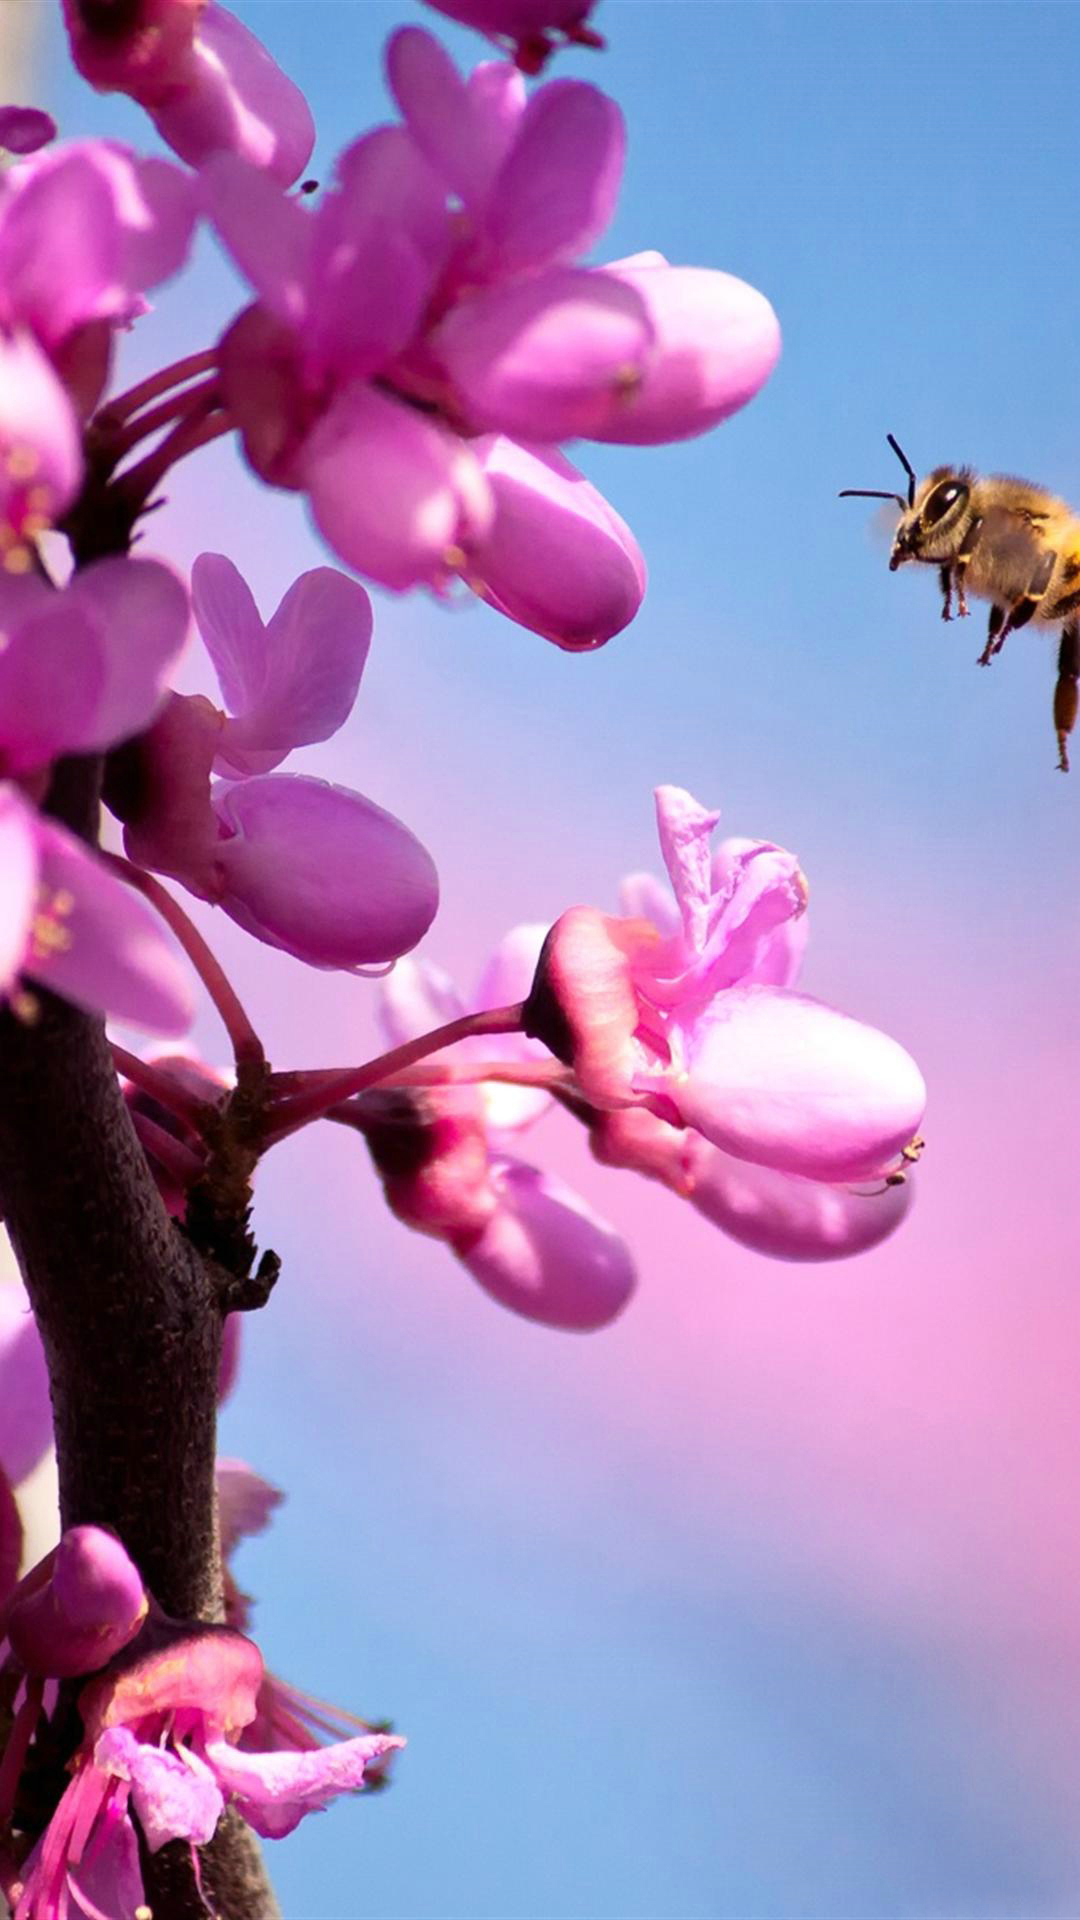 Free Fall Season Wallpaper Flower Iphone Images Free Download Pixelstalk Net